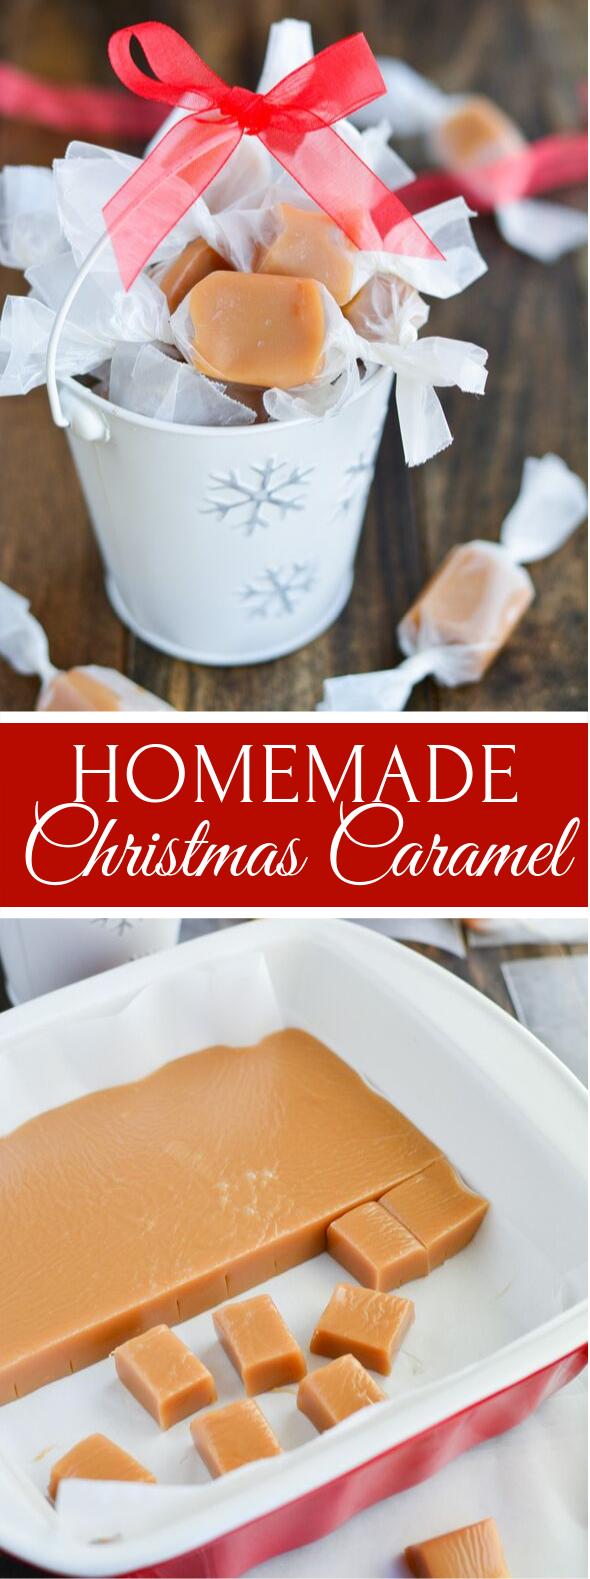 HOMEMADE CARAMELS #desserts #thanksgiving